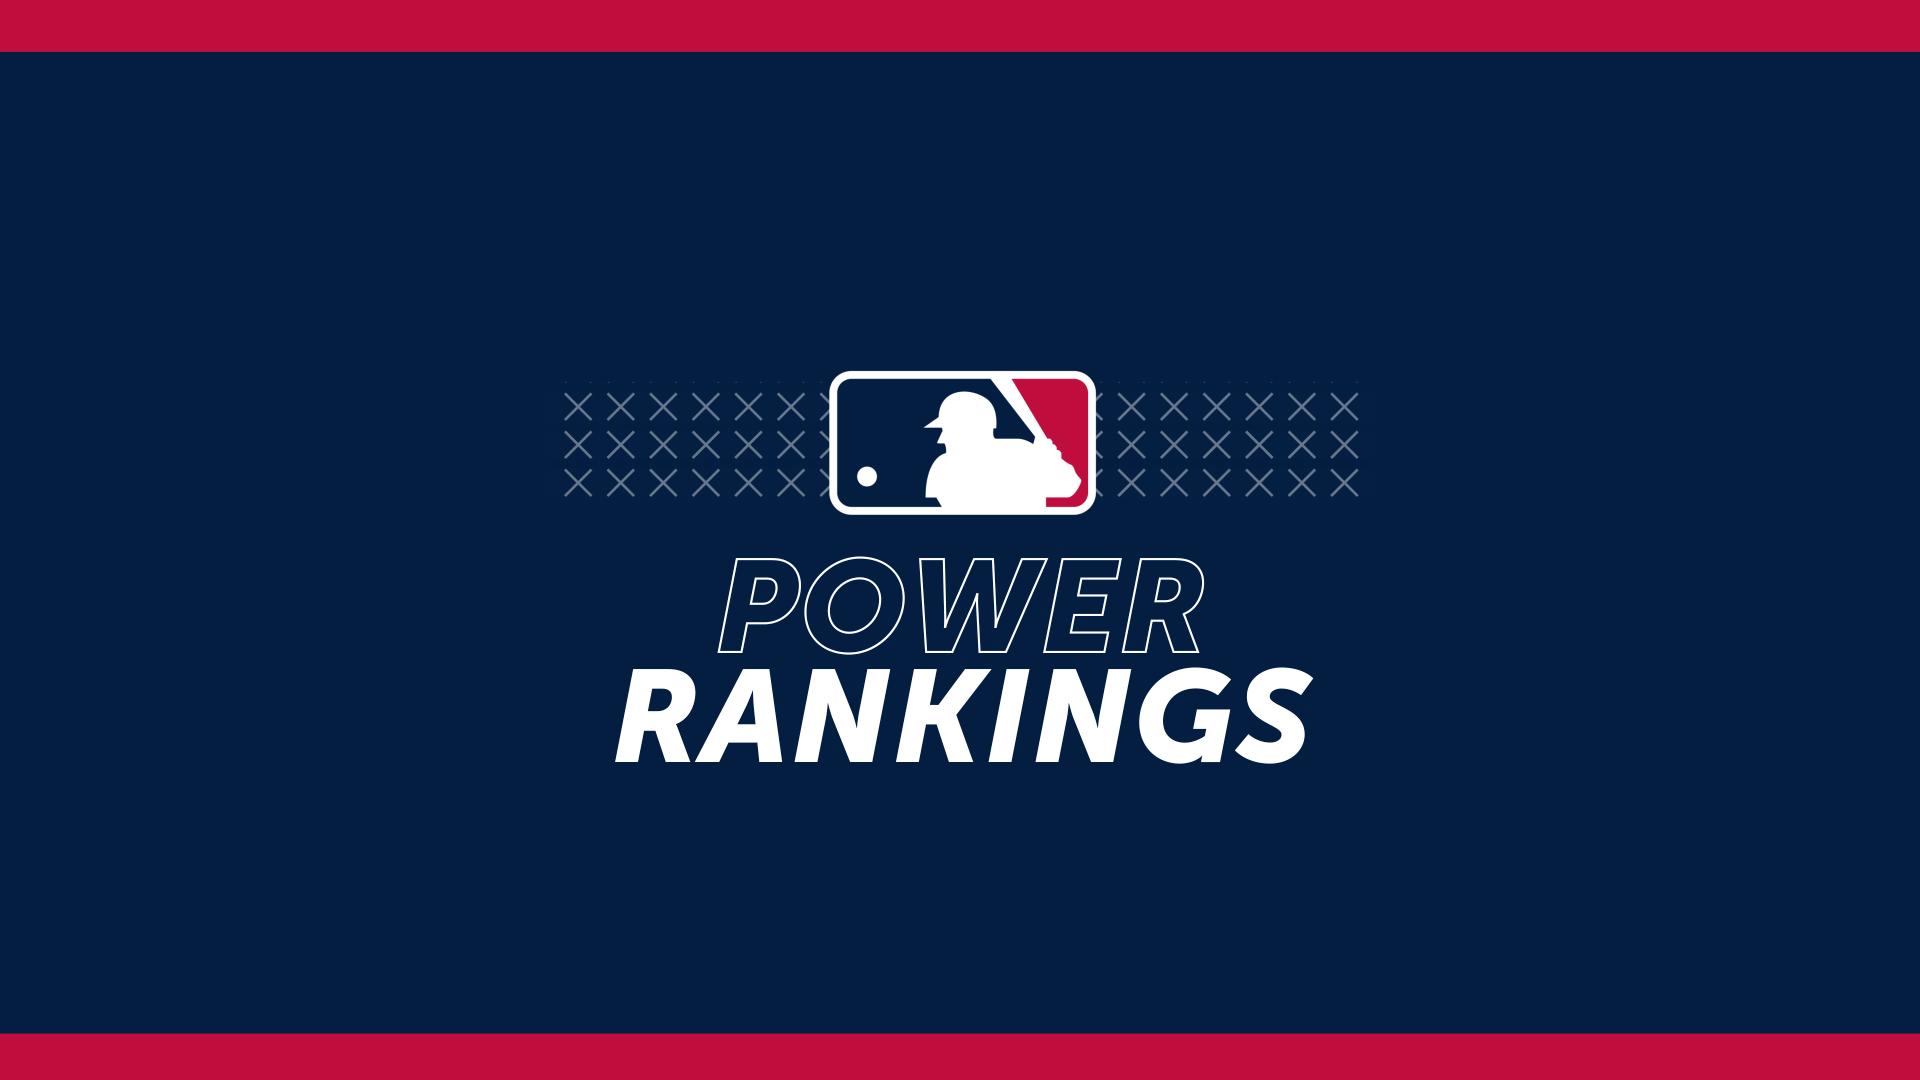 MLB Power Rankings 2021: Giants, Surging Astros Top Standings